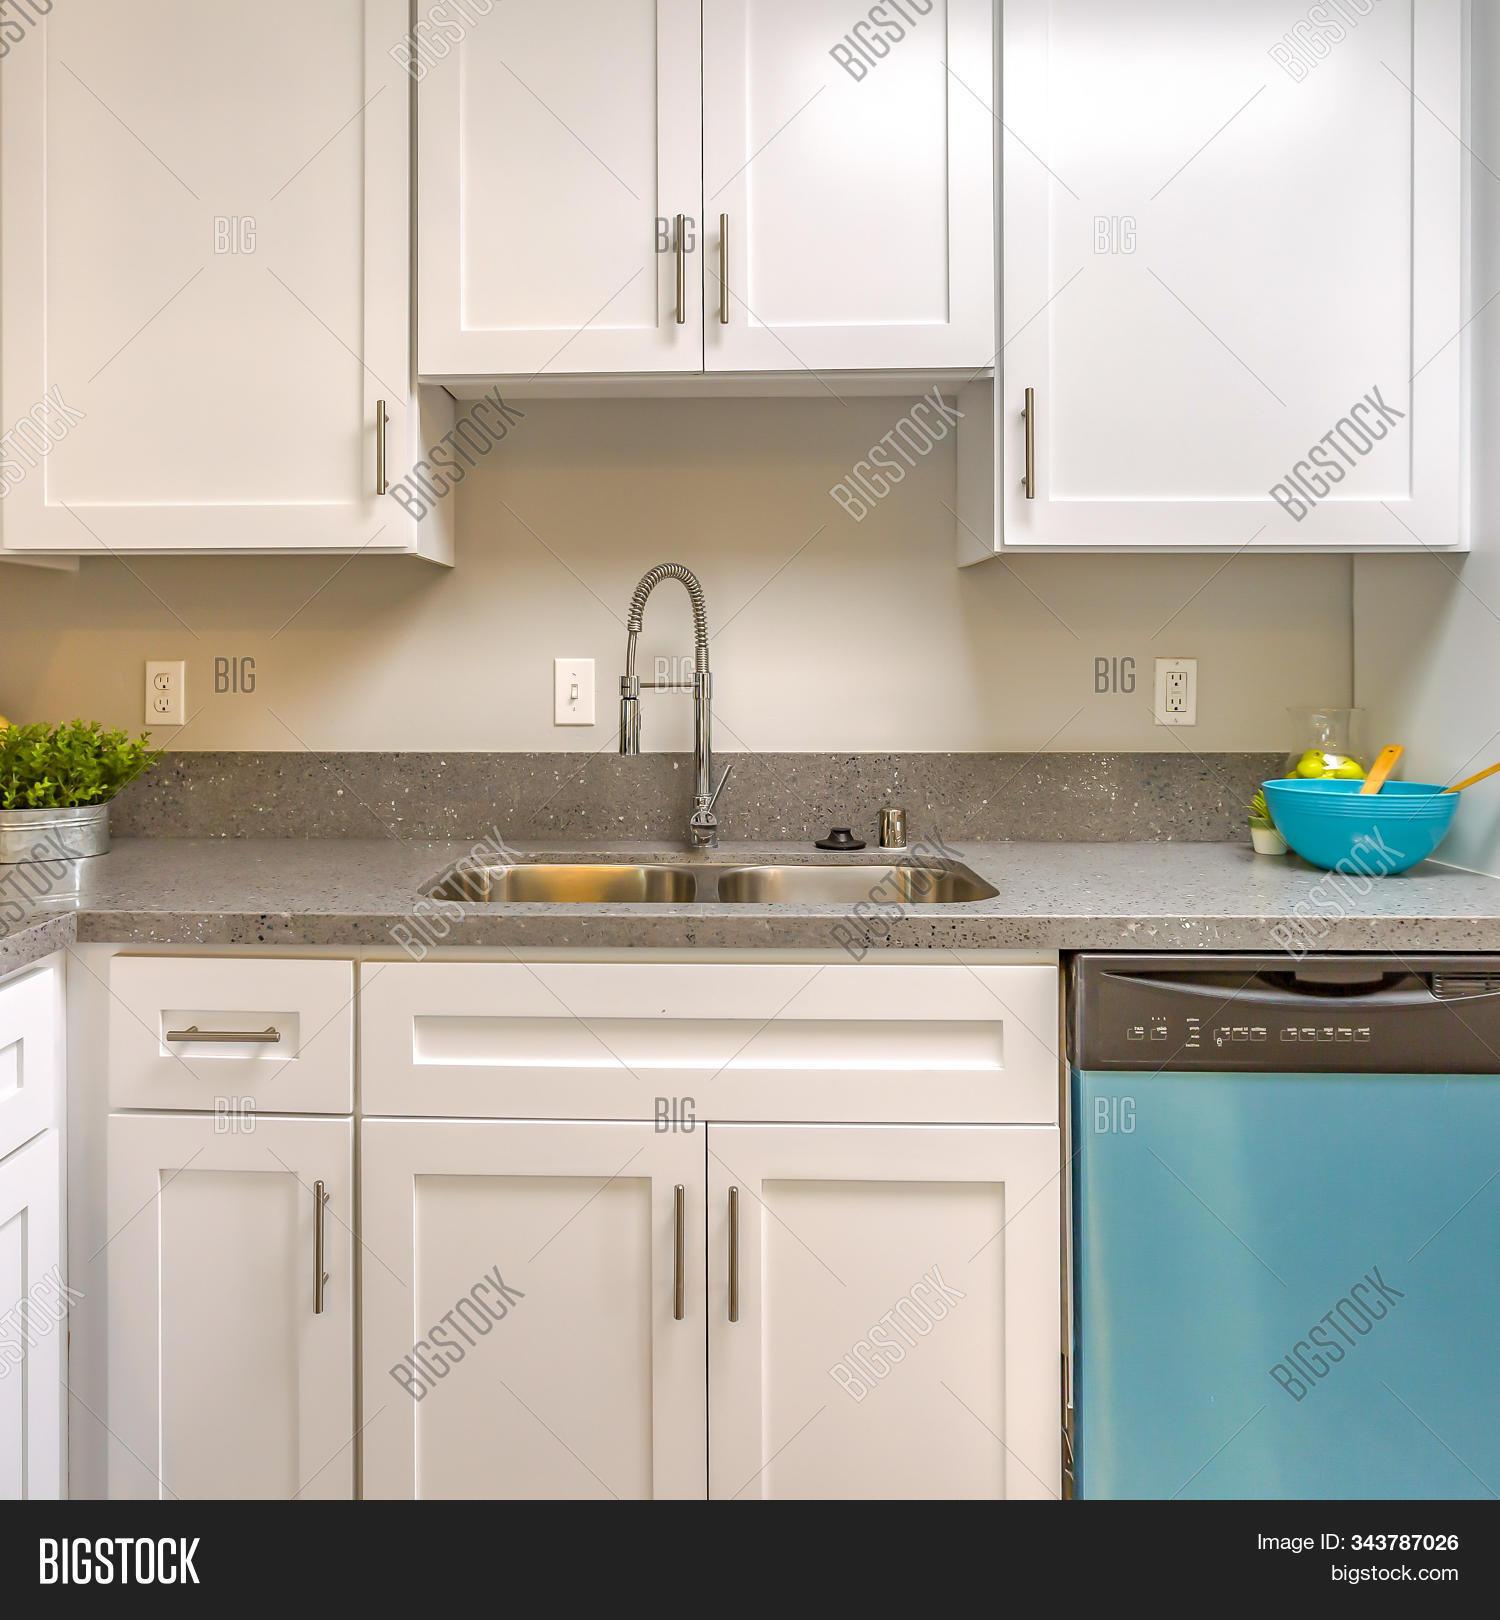 - Square Frame Kitchen Image & Photo (Free Trial) Bigstock